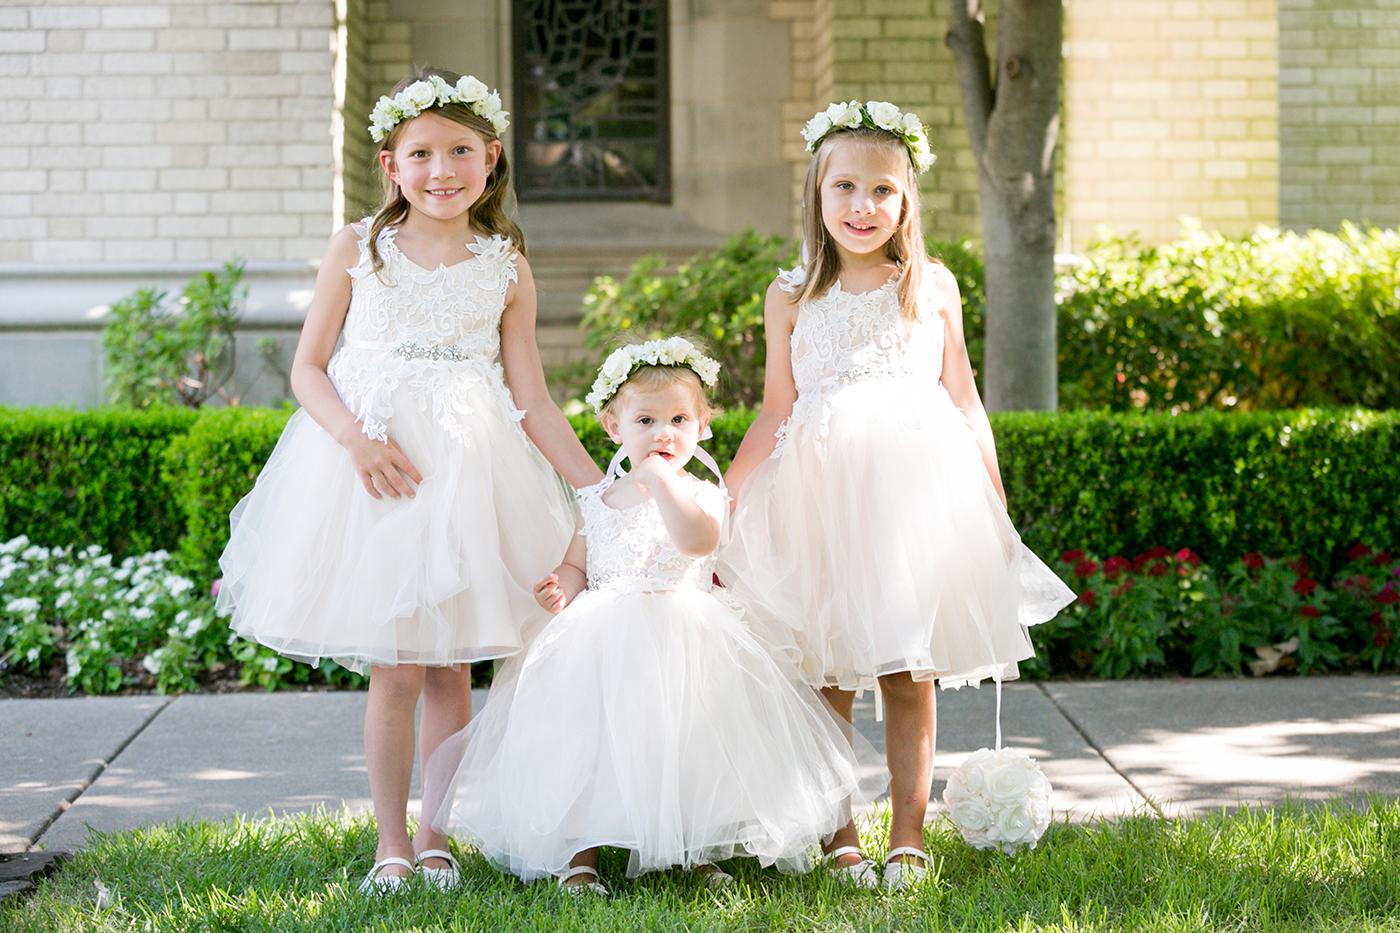 Wedding Planner Dallas TX - Allday Events - Highland Park - Marie Gabrielle Wedding - 207.jpg